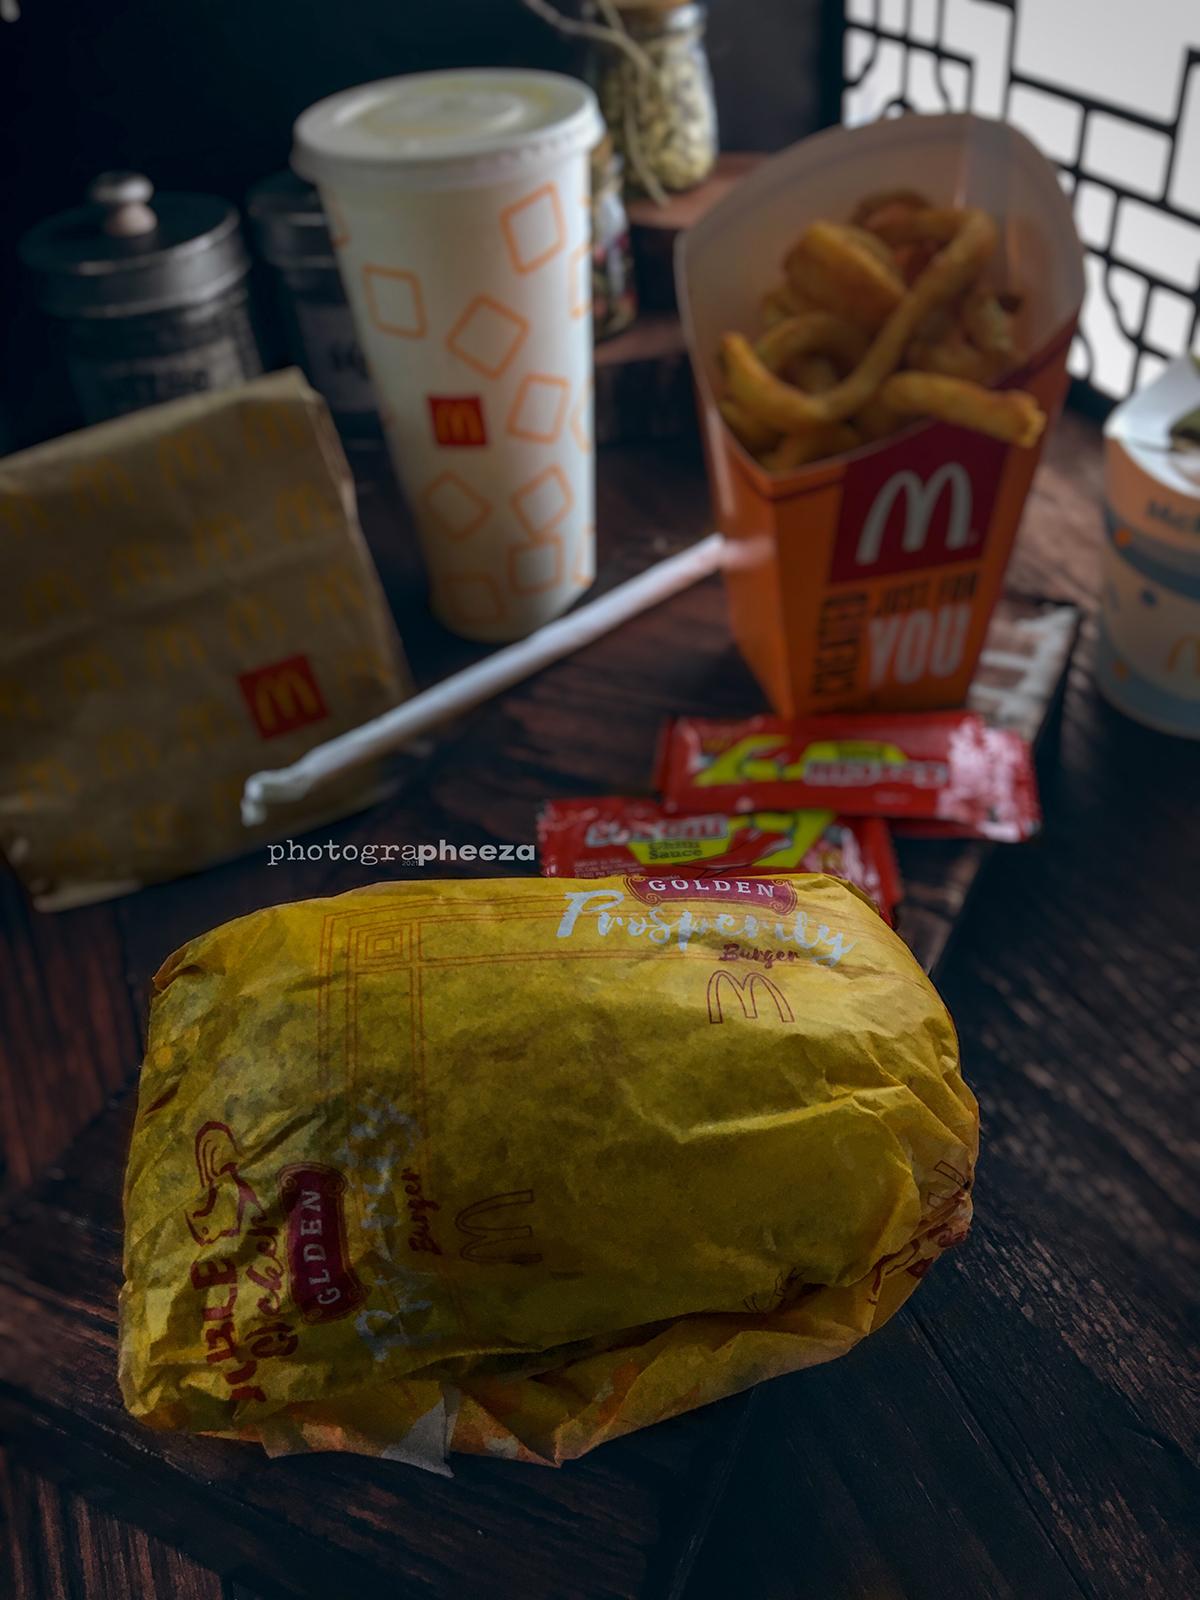 Golden Prosperity burger price Set Large RM17.43